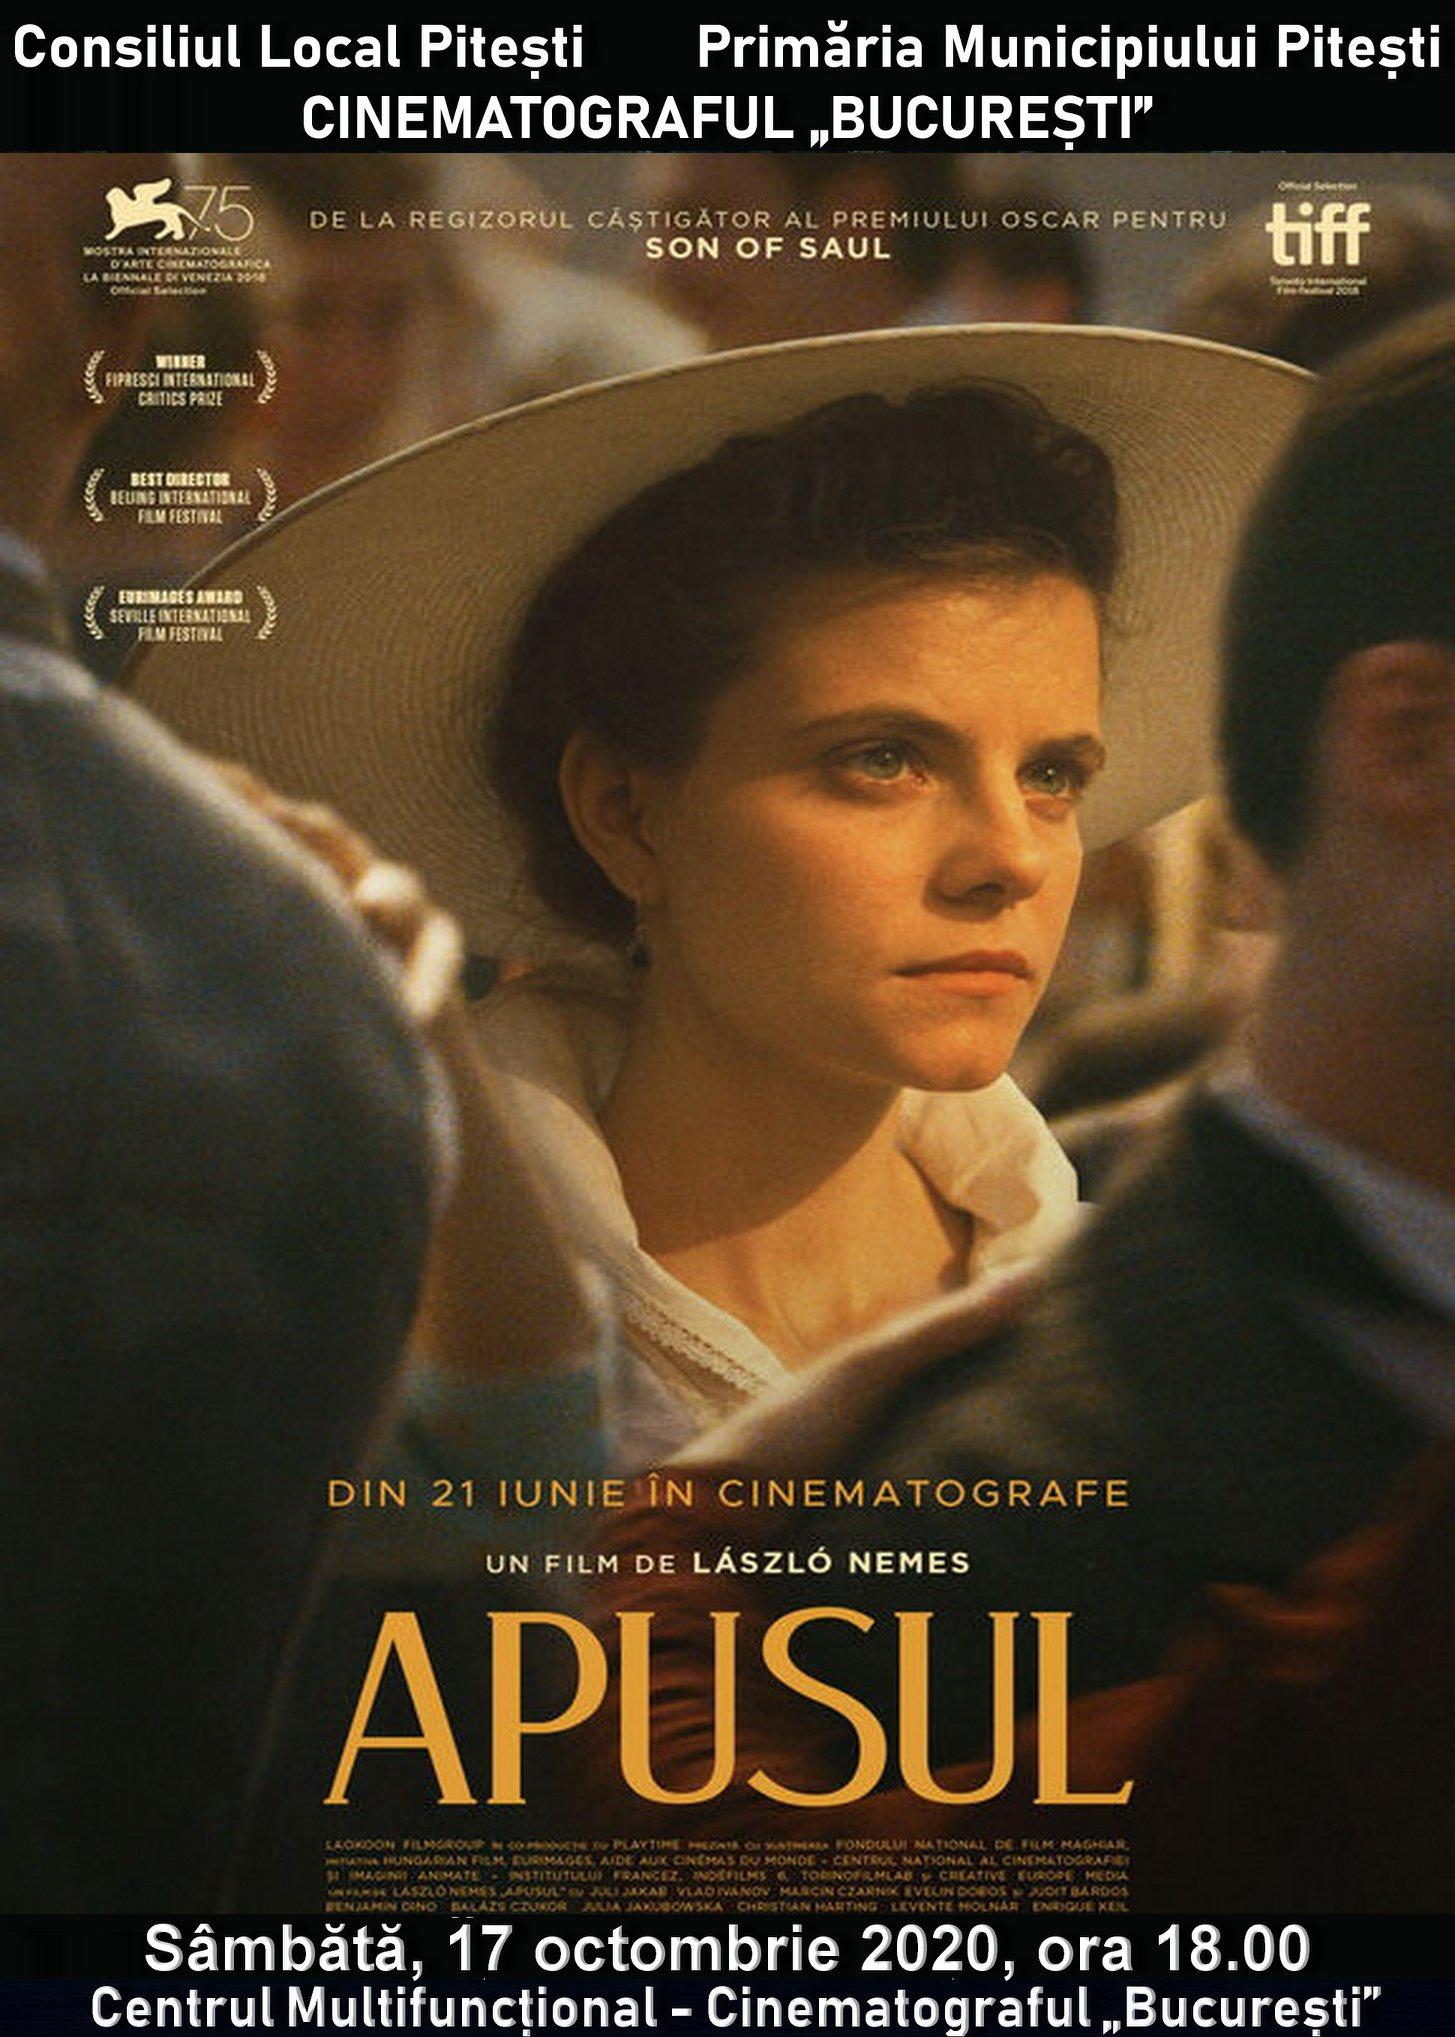 Apusul - afiș cinema